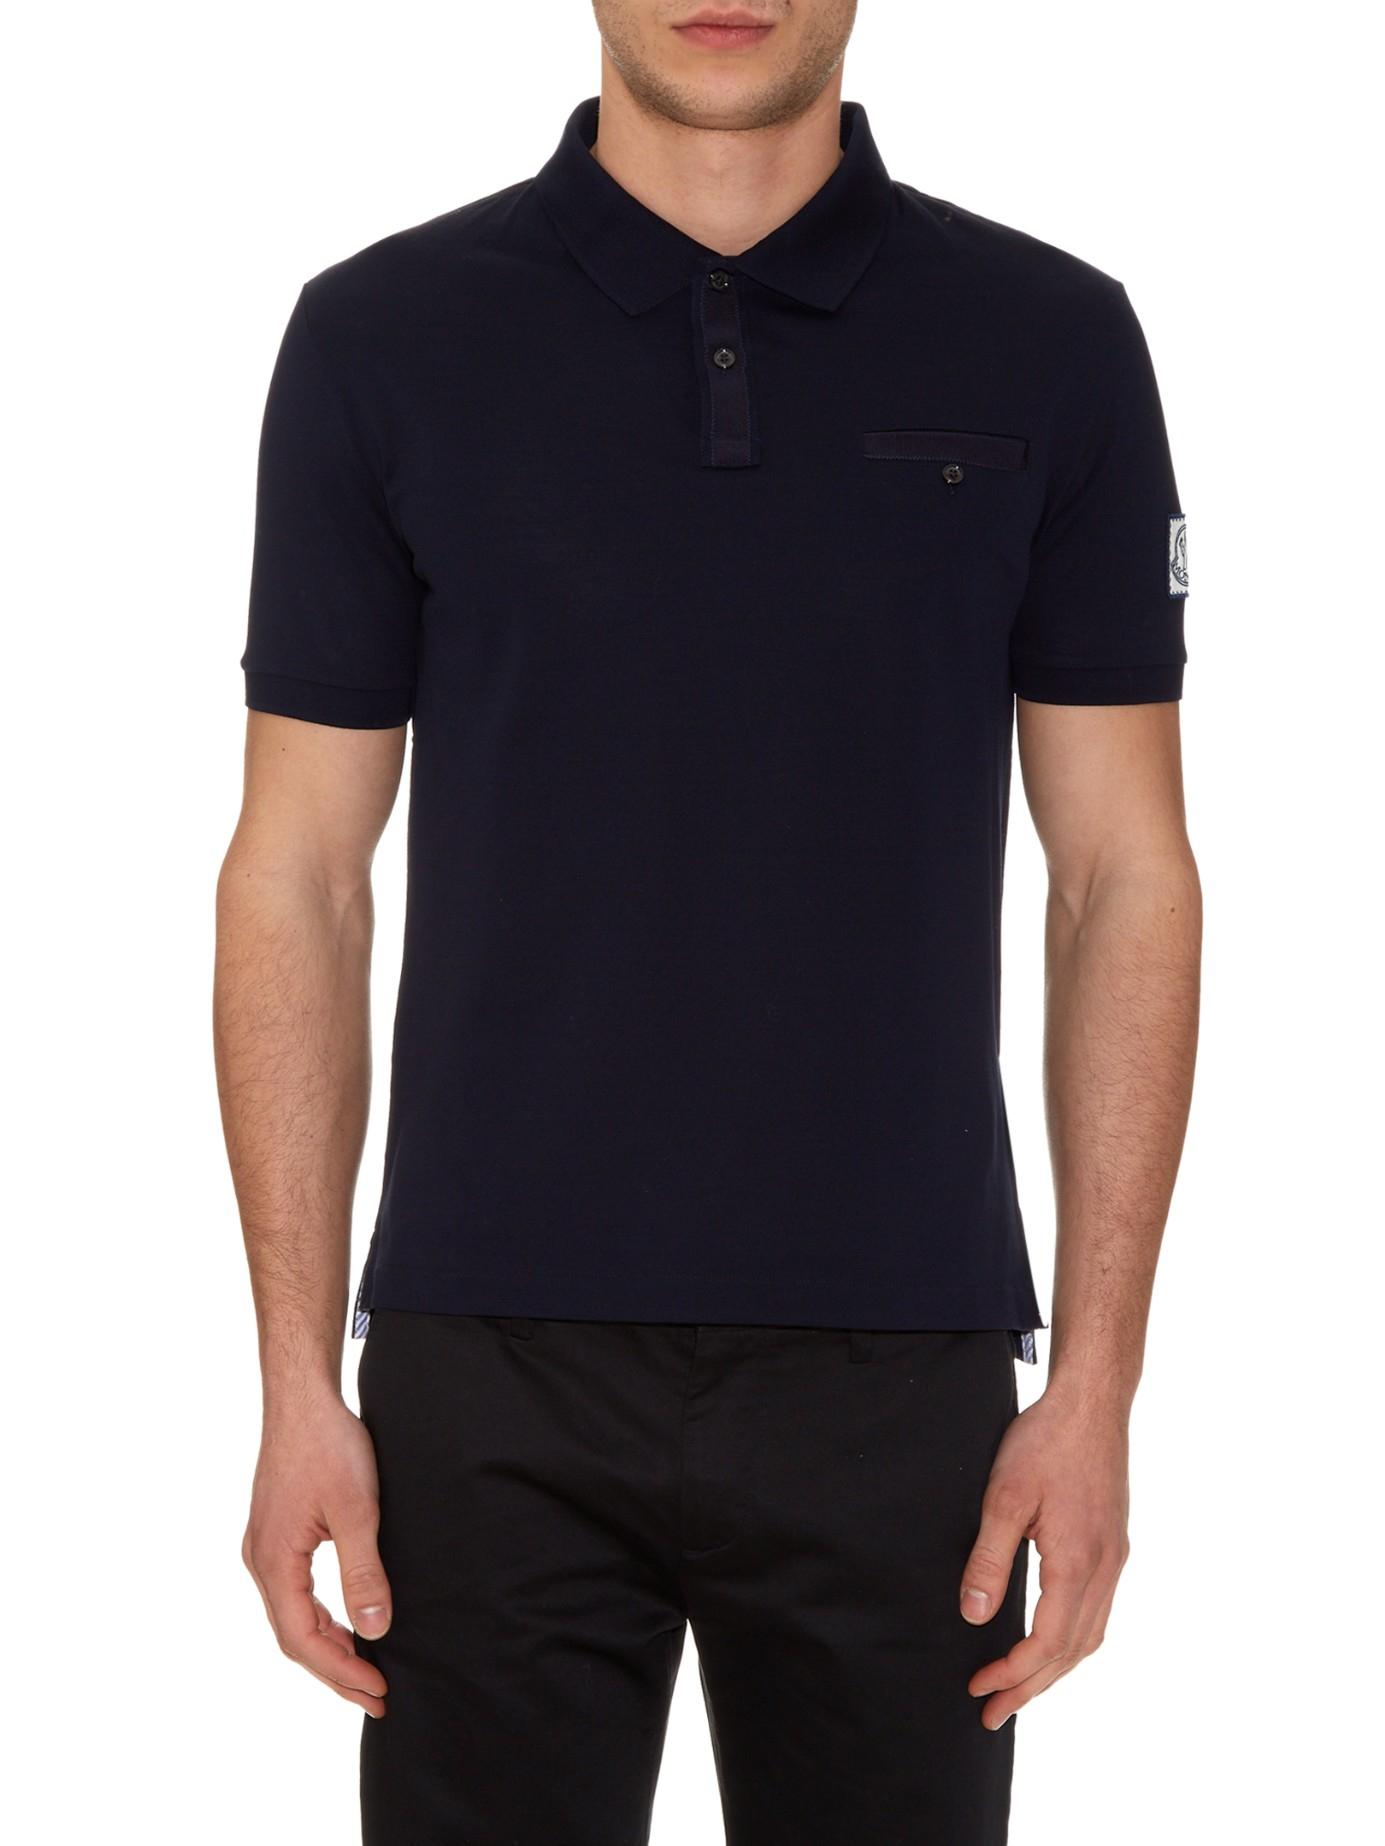 Black Friday moncler gamme bleu polo shirt herren jacke mit fell